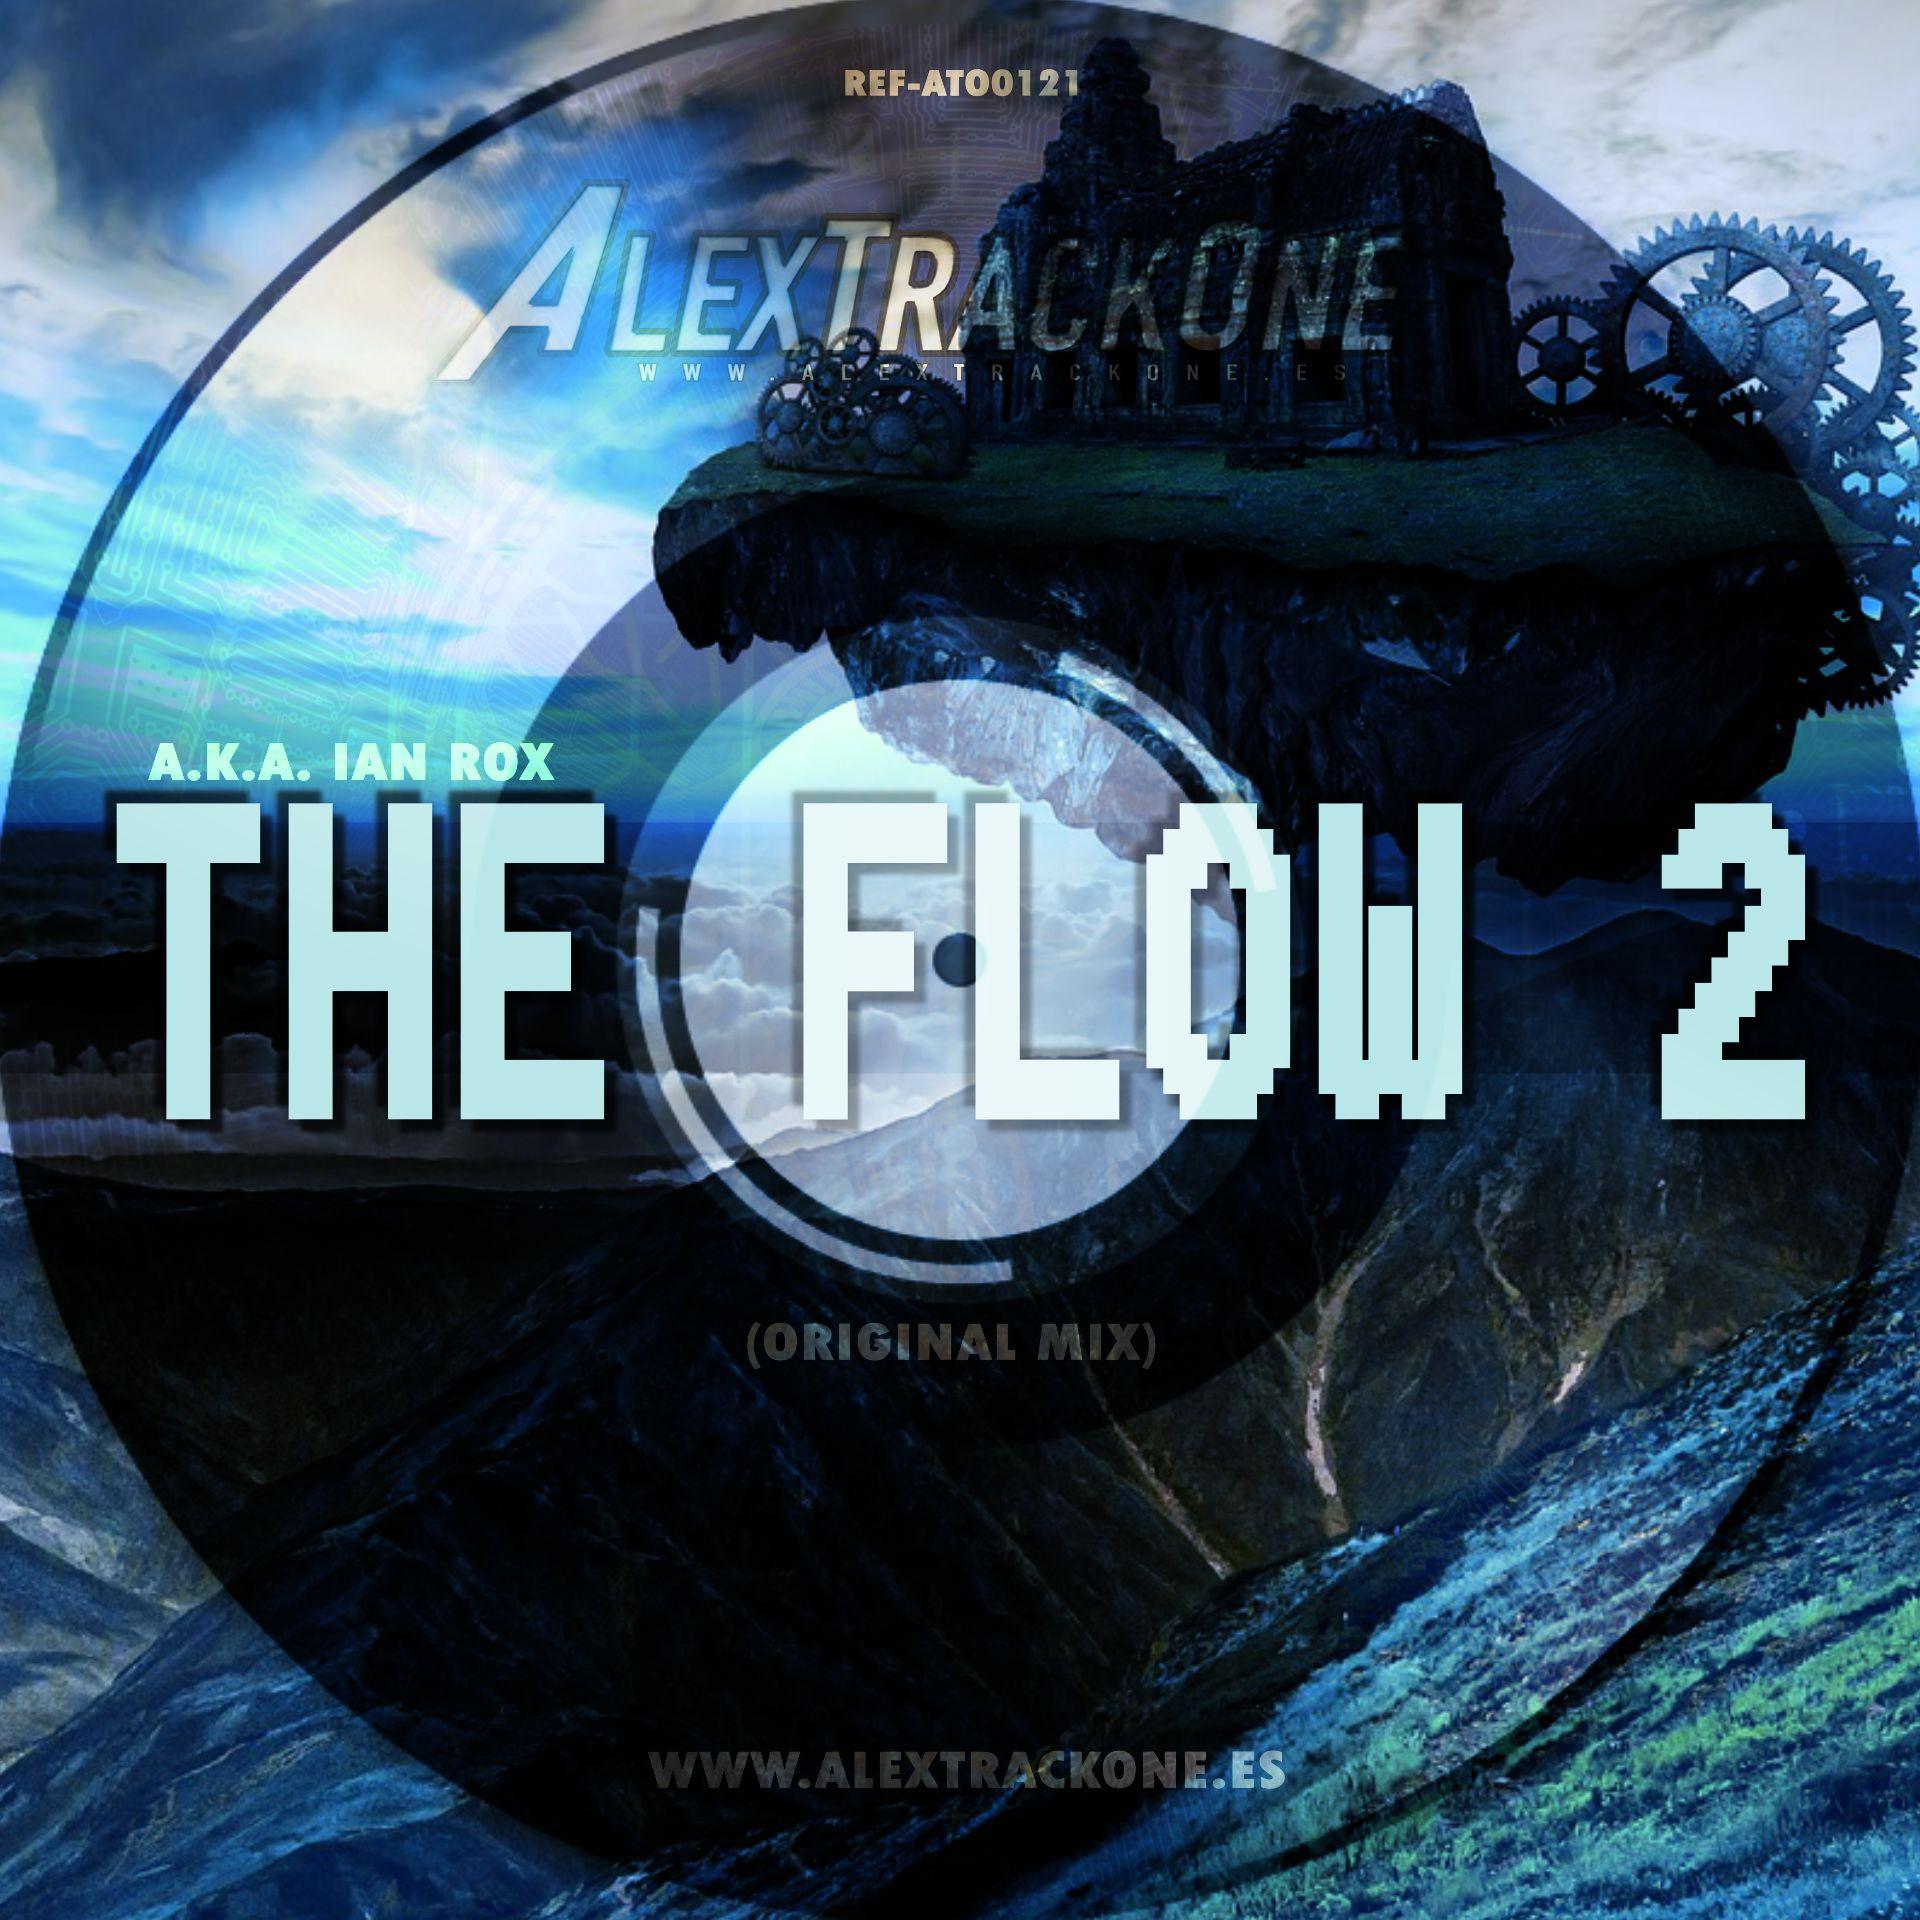 REF-ATO0121 AKA IAN ROX - THE FLOW 2 (ORIGINAL MIX) (MP3 & WAV & FLAC)